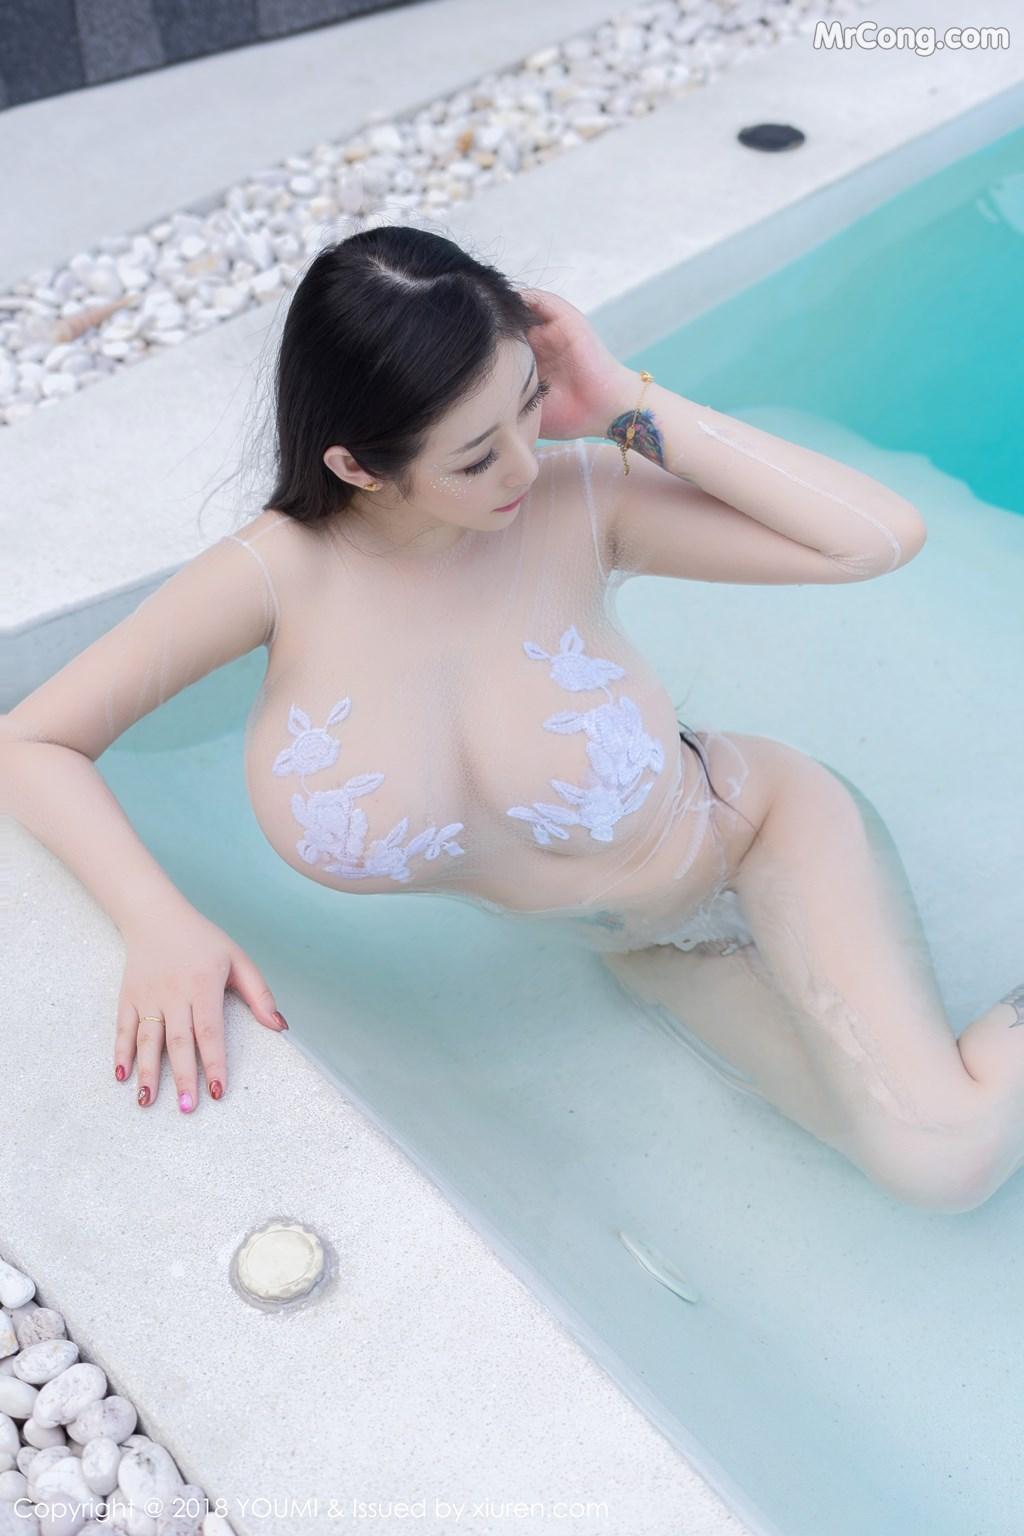 Image YouMi-Vol.183-Daji-Toxic-MrCong.com-002 in post YouMi Vol.183: Người mẫu Daji_Toxic (妲己_Toxic) (46 ảnh)